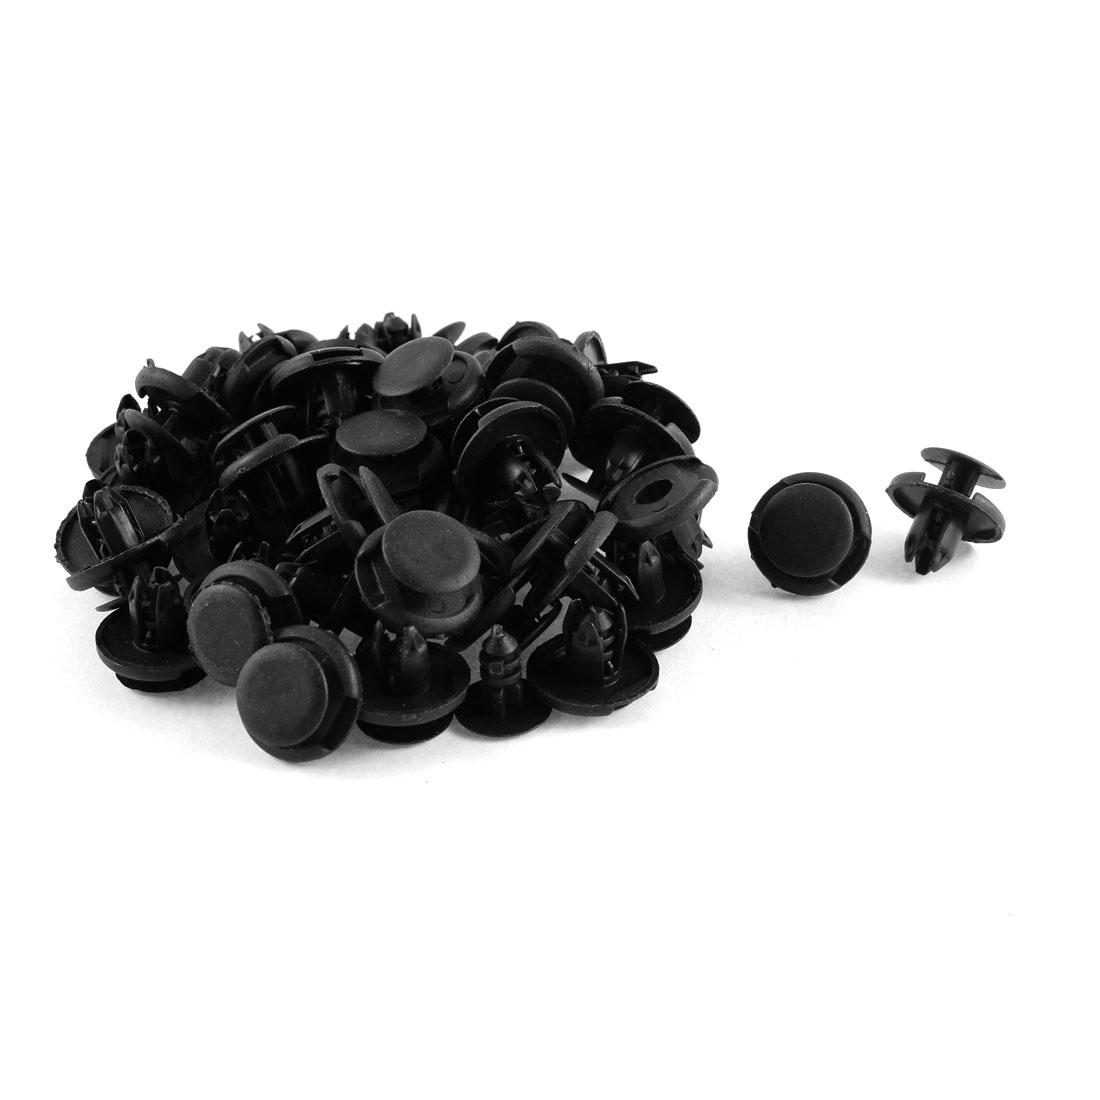 50 Pcs Black Plastic Splash Guard Push-Type Mat Clips 8mm x 10mm x 19mm